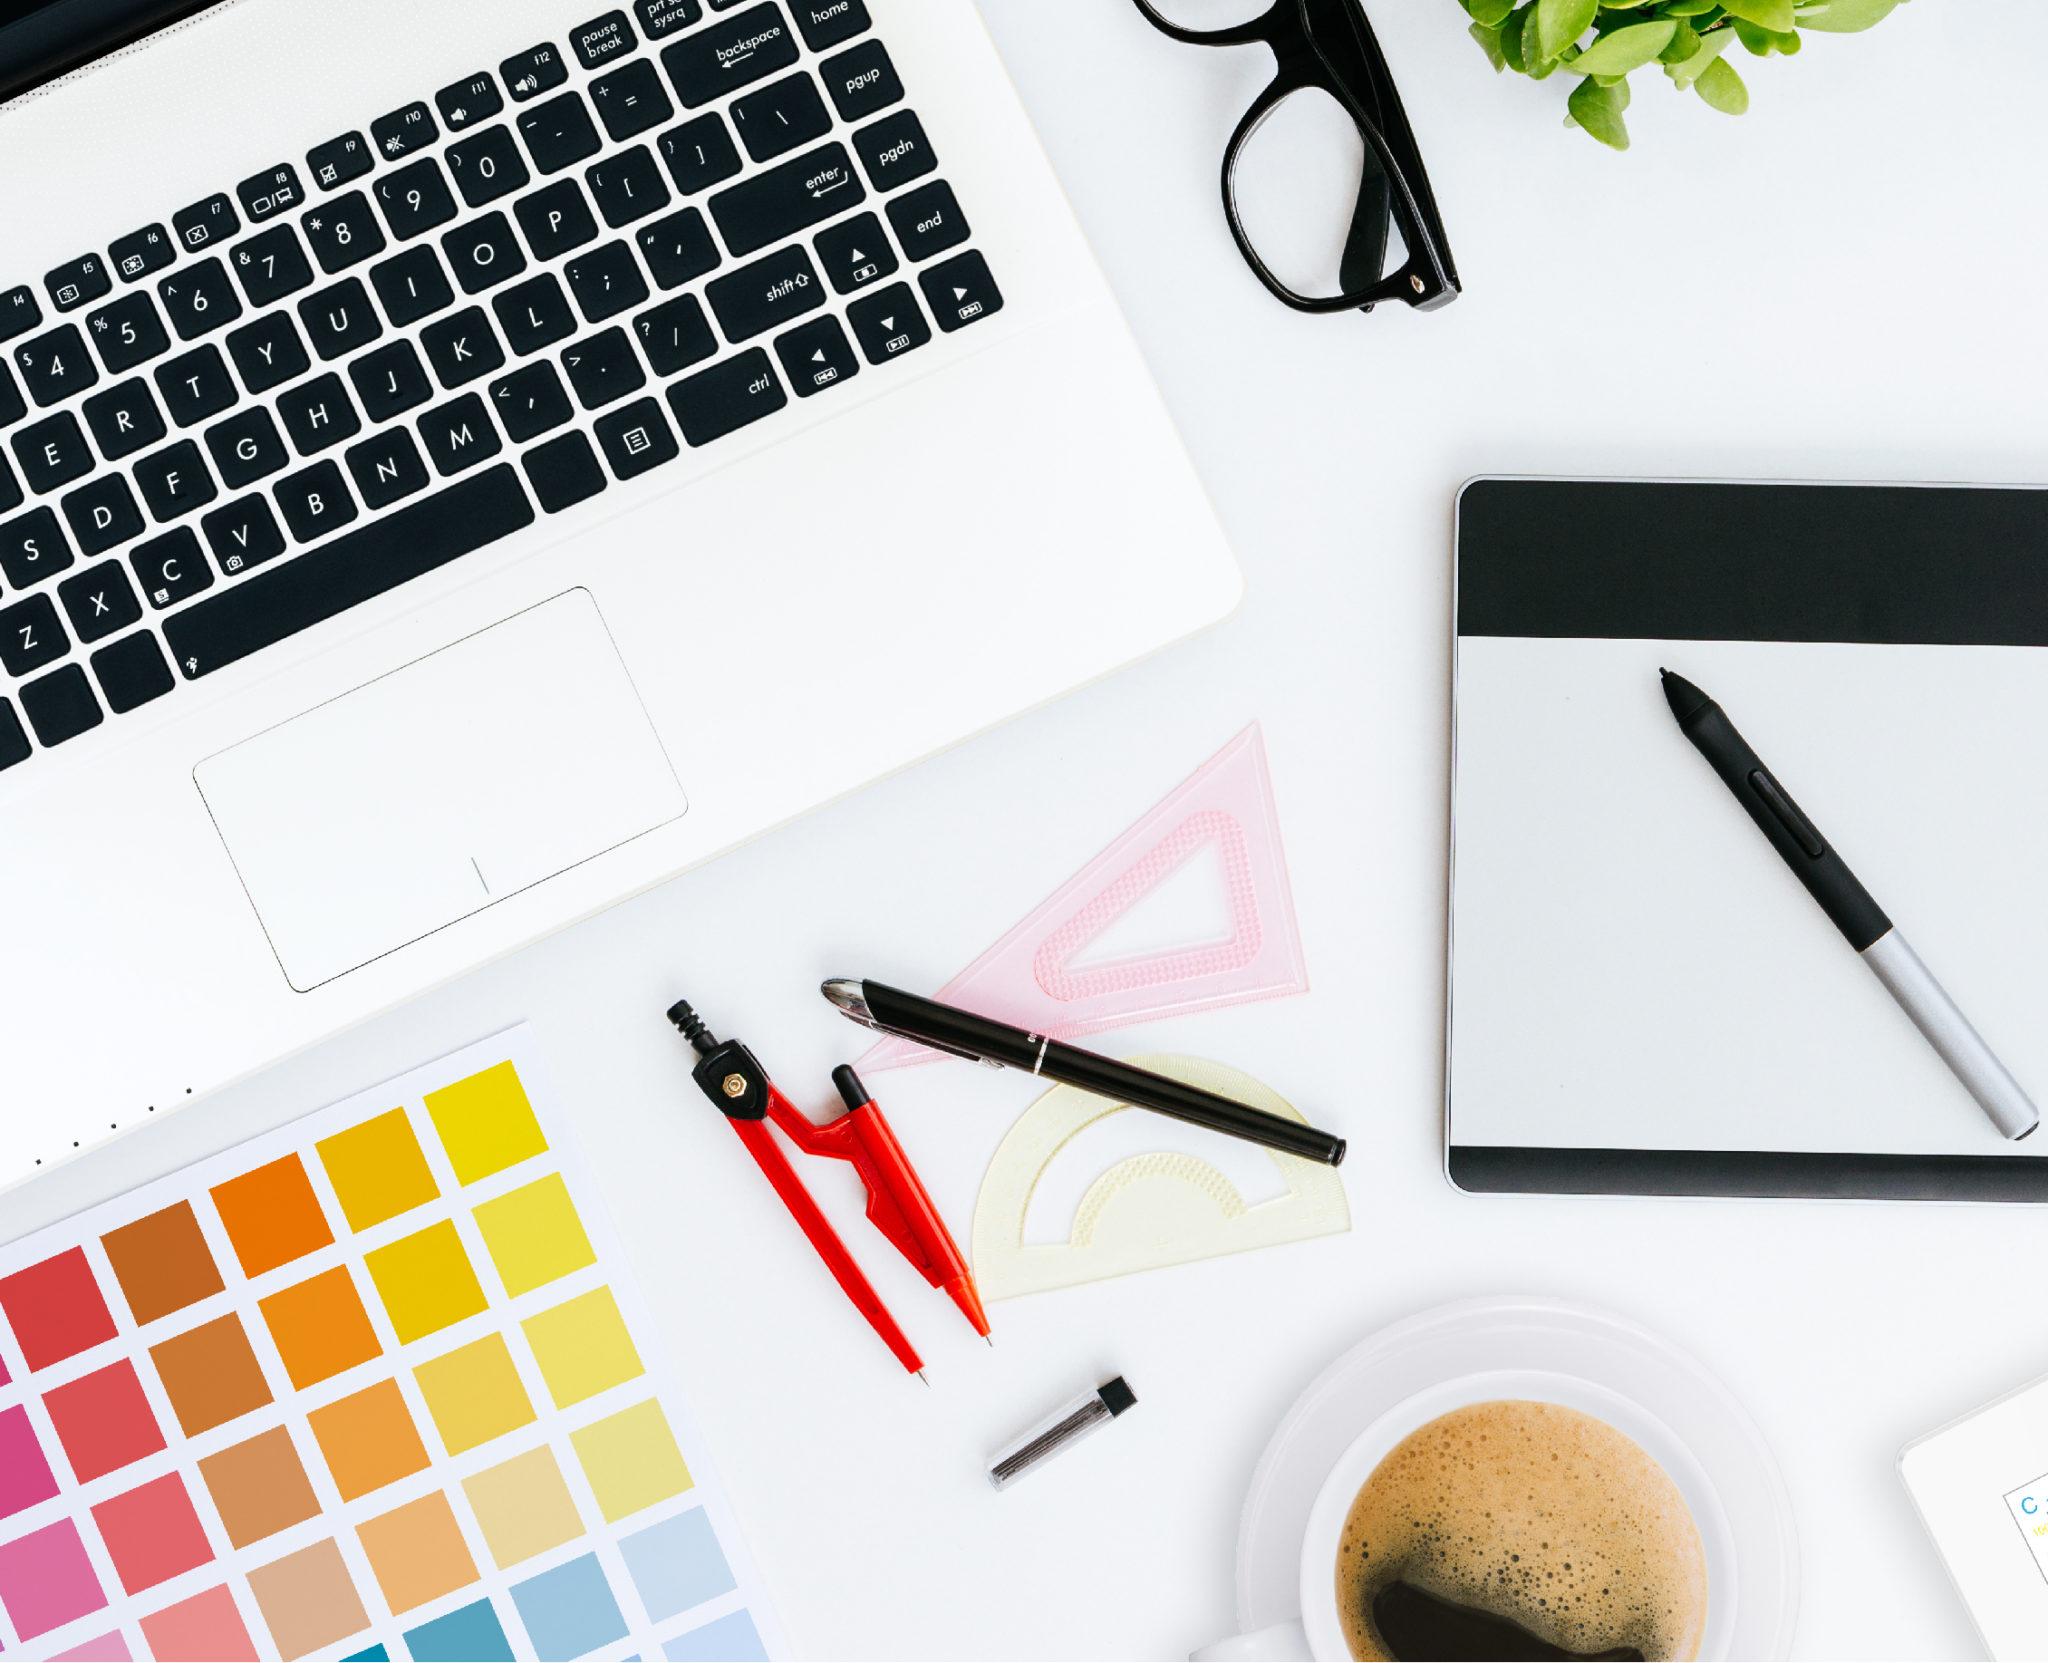 Logosuunnittelu – dos and don'ts